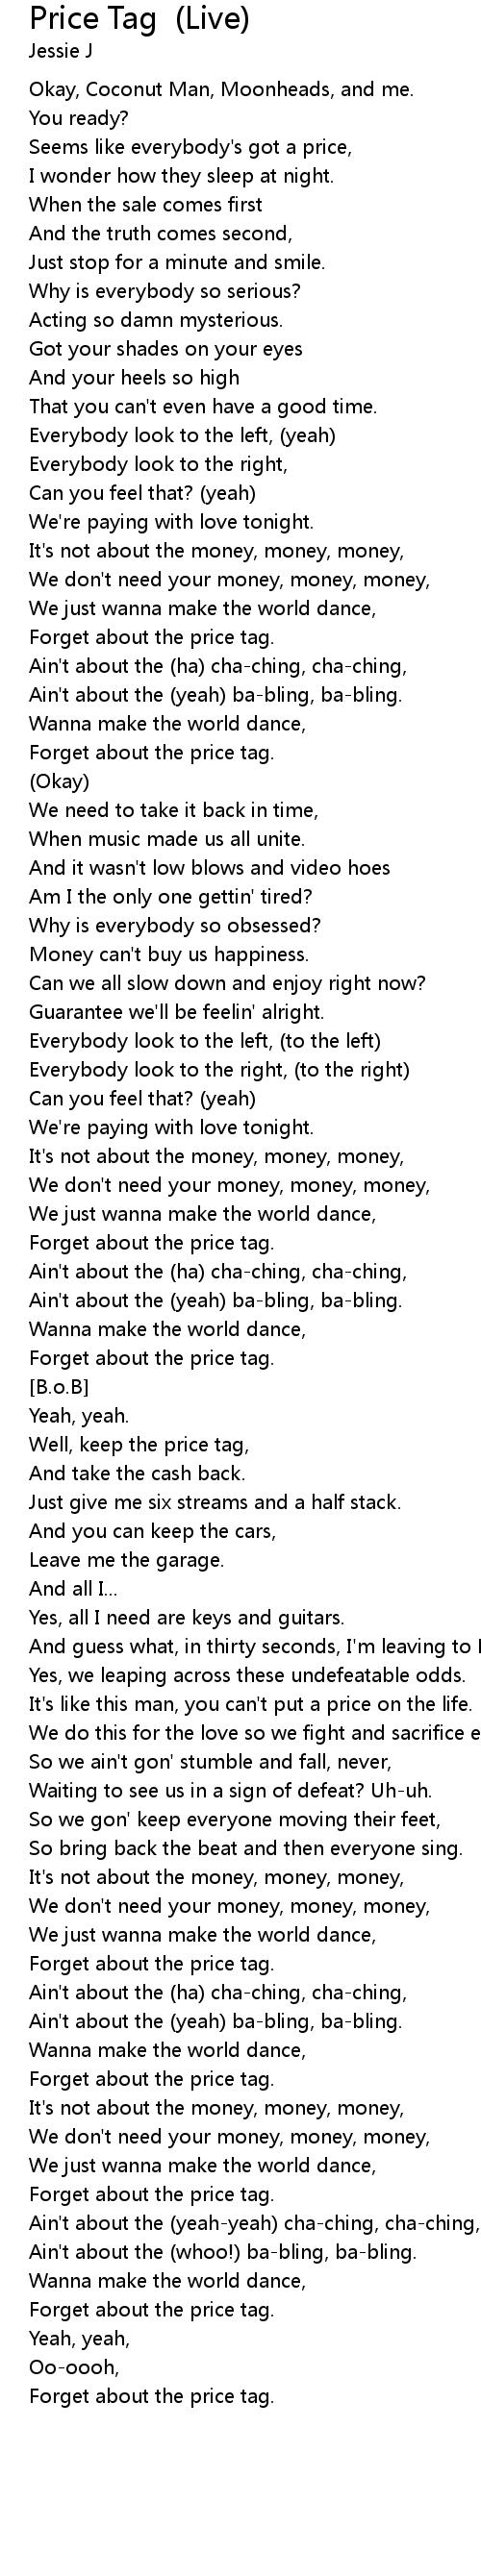 Price Tag Live Lyrics Follow Lyrics